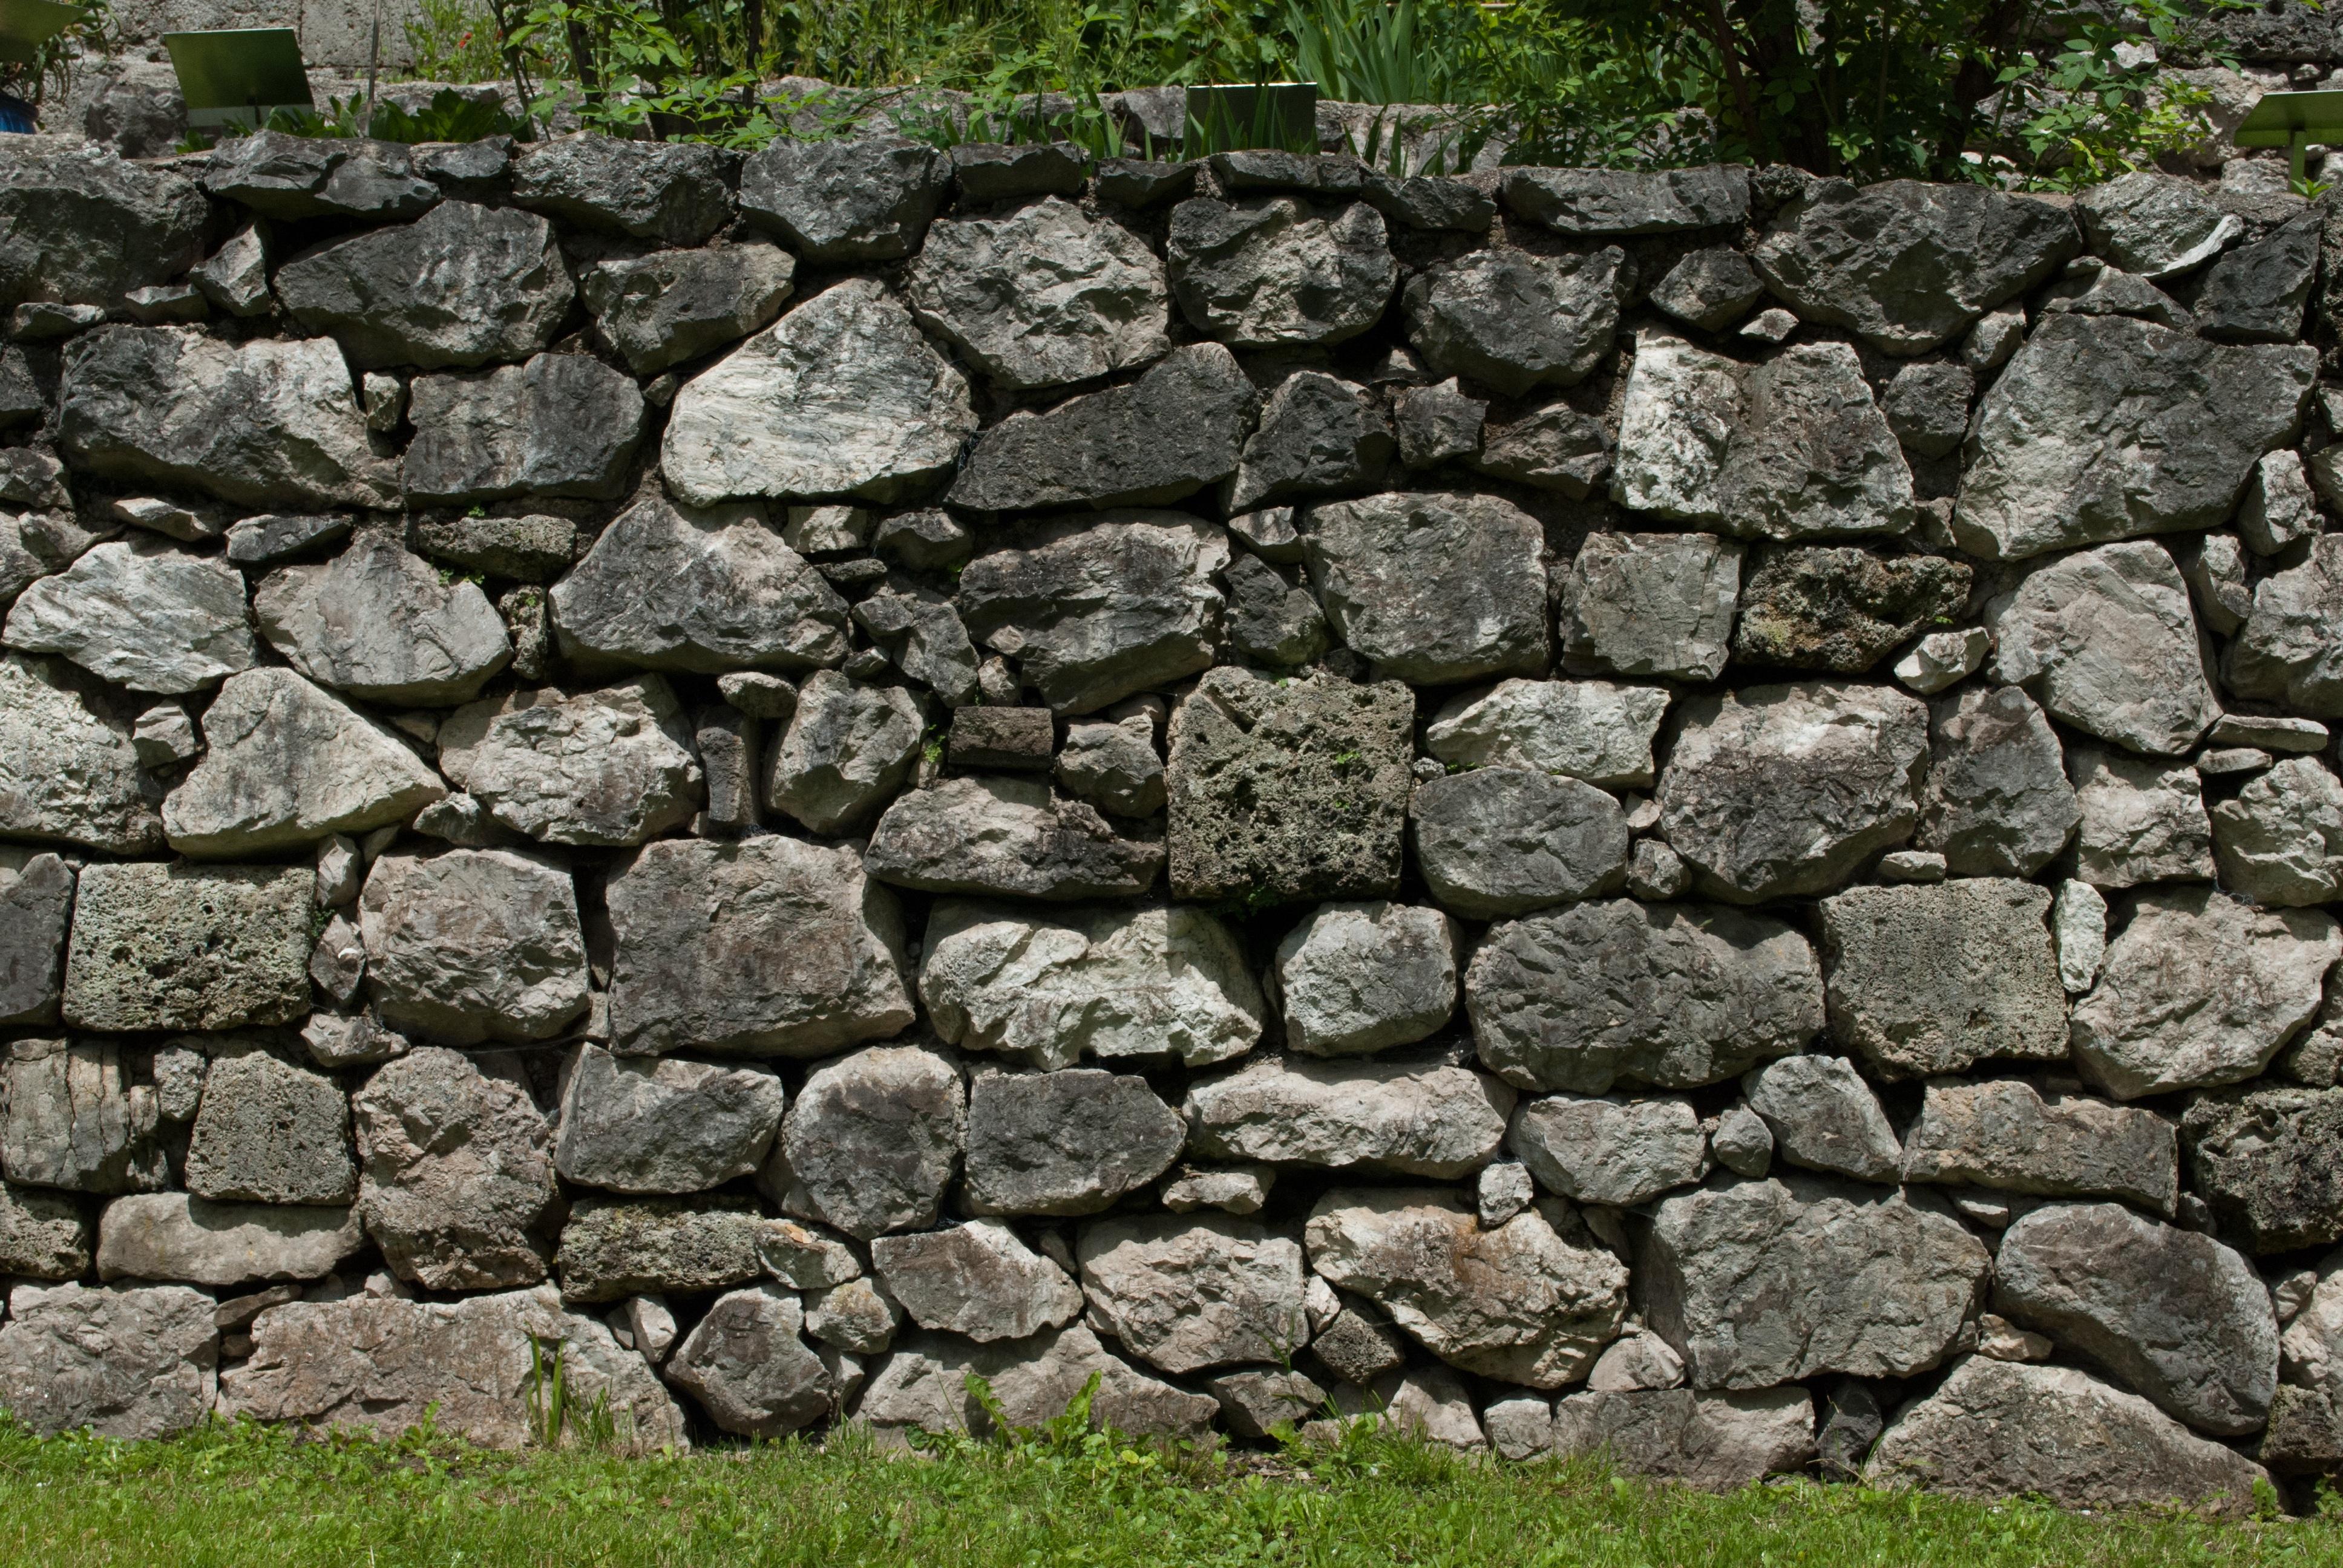 Free images nature grass rock plant building - Muro de piedra natural ...